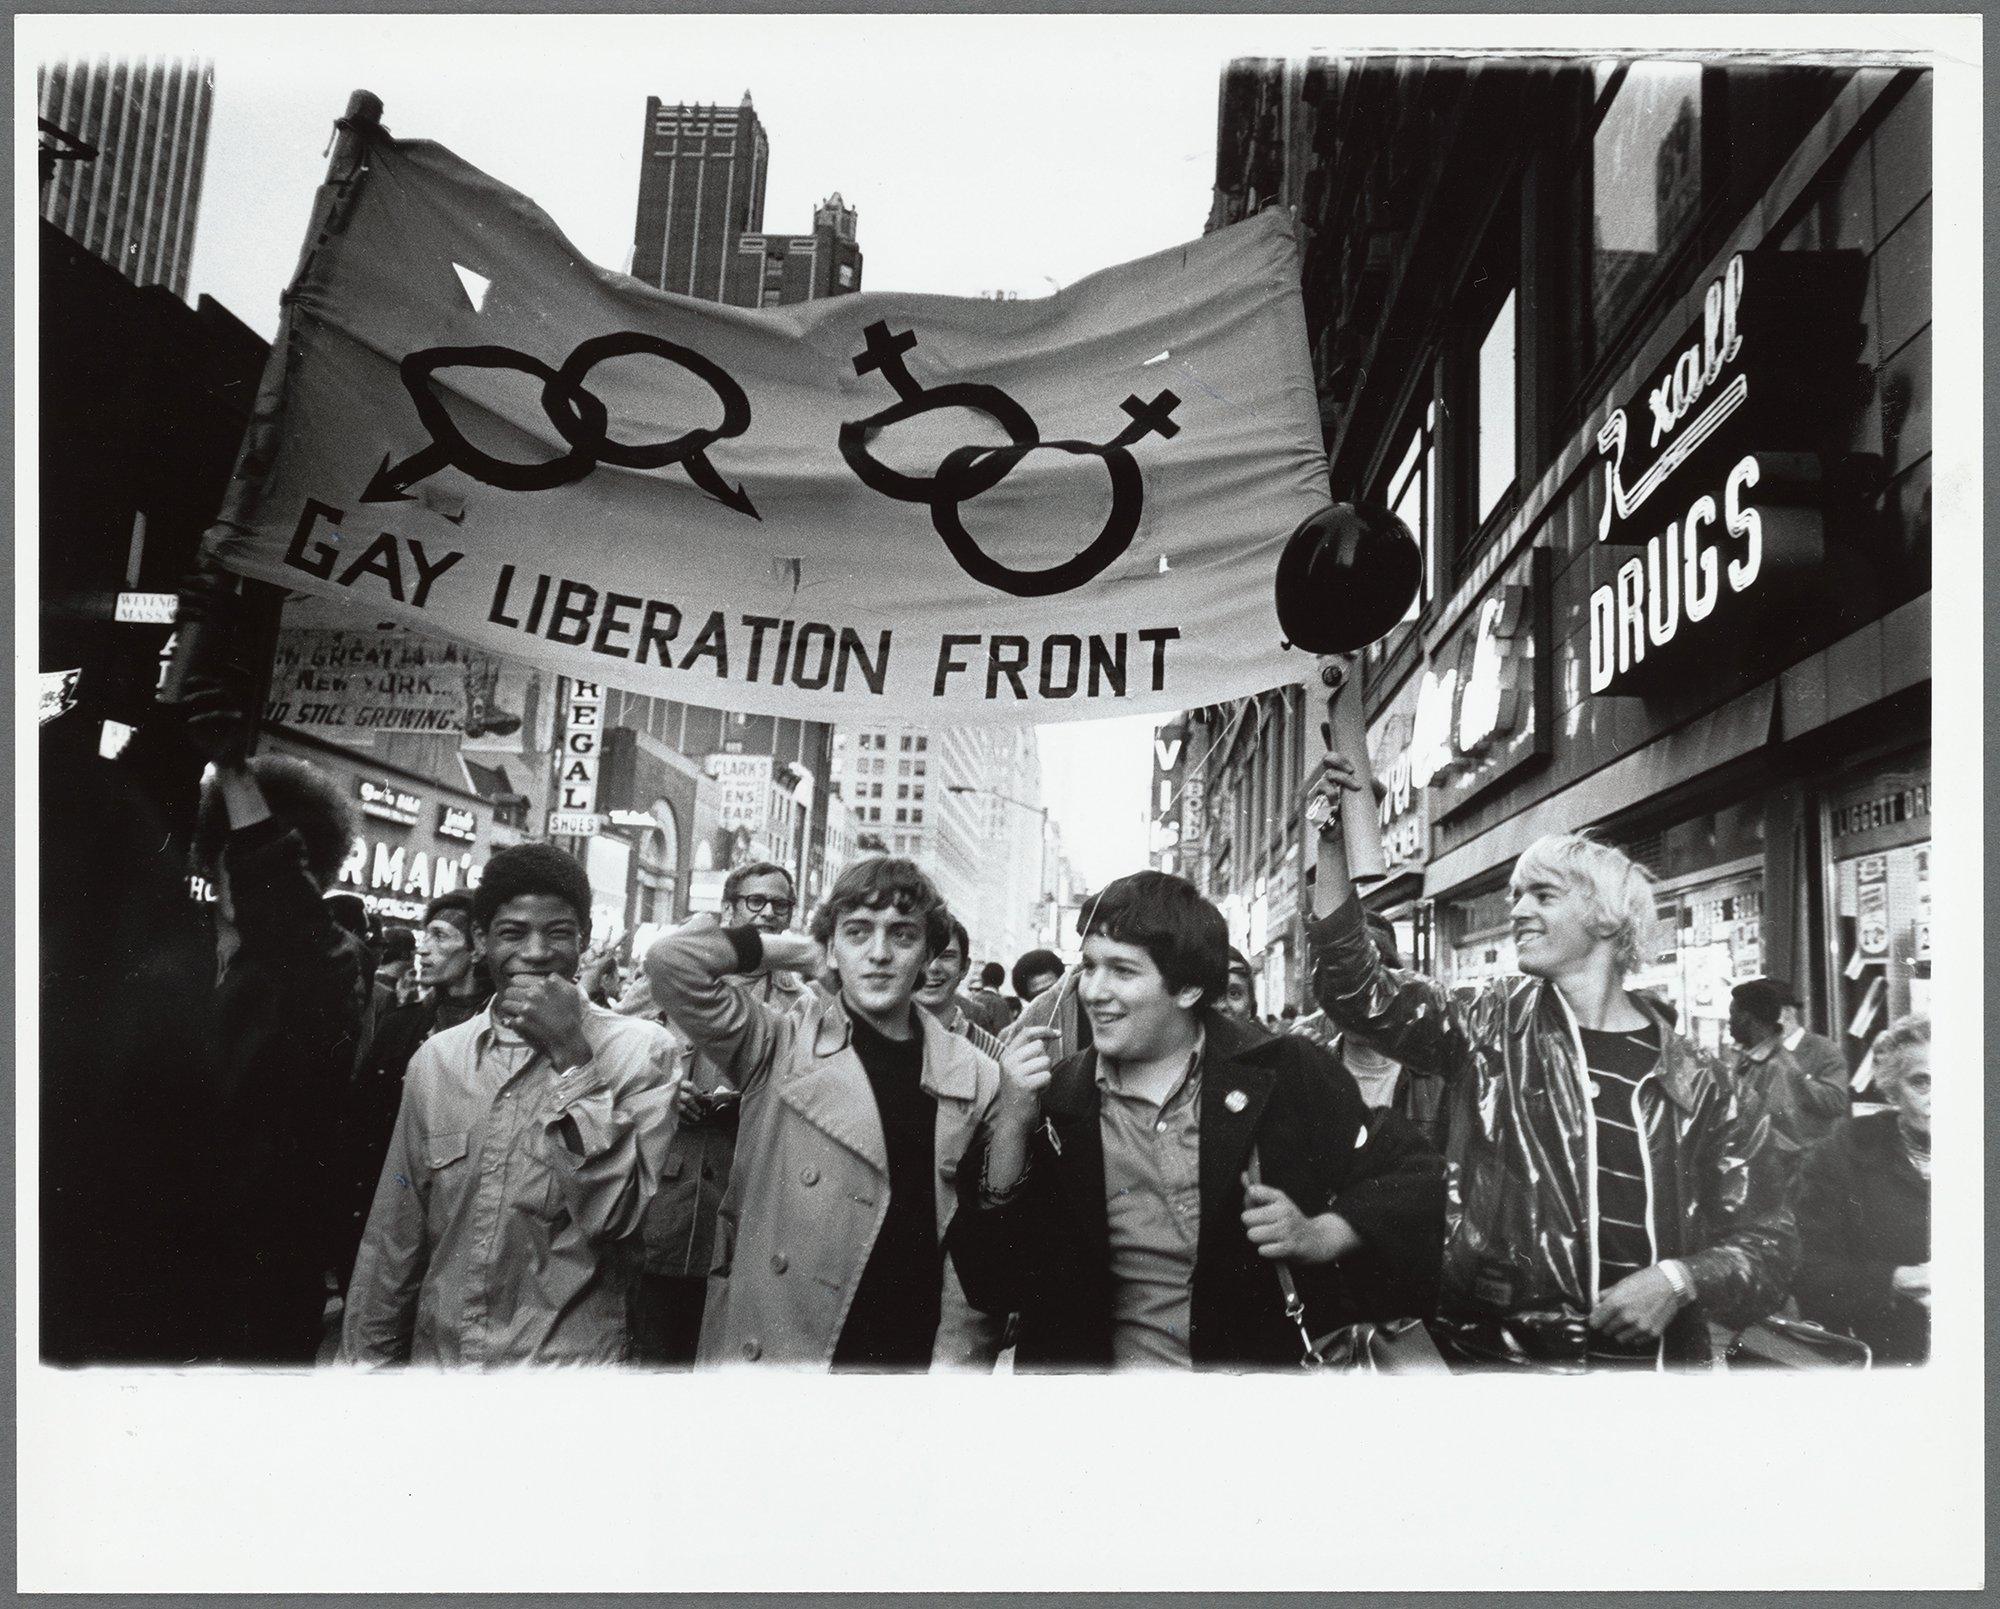 Pride_Stonewall50_NewYork_010.jpg